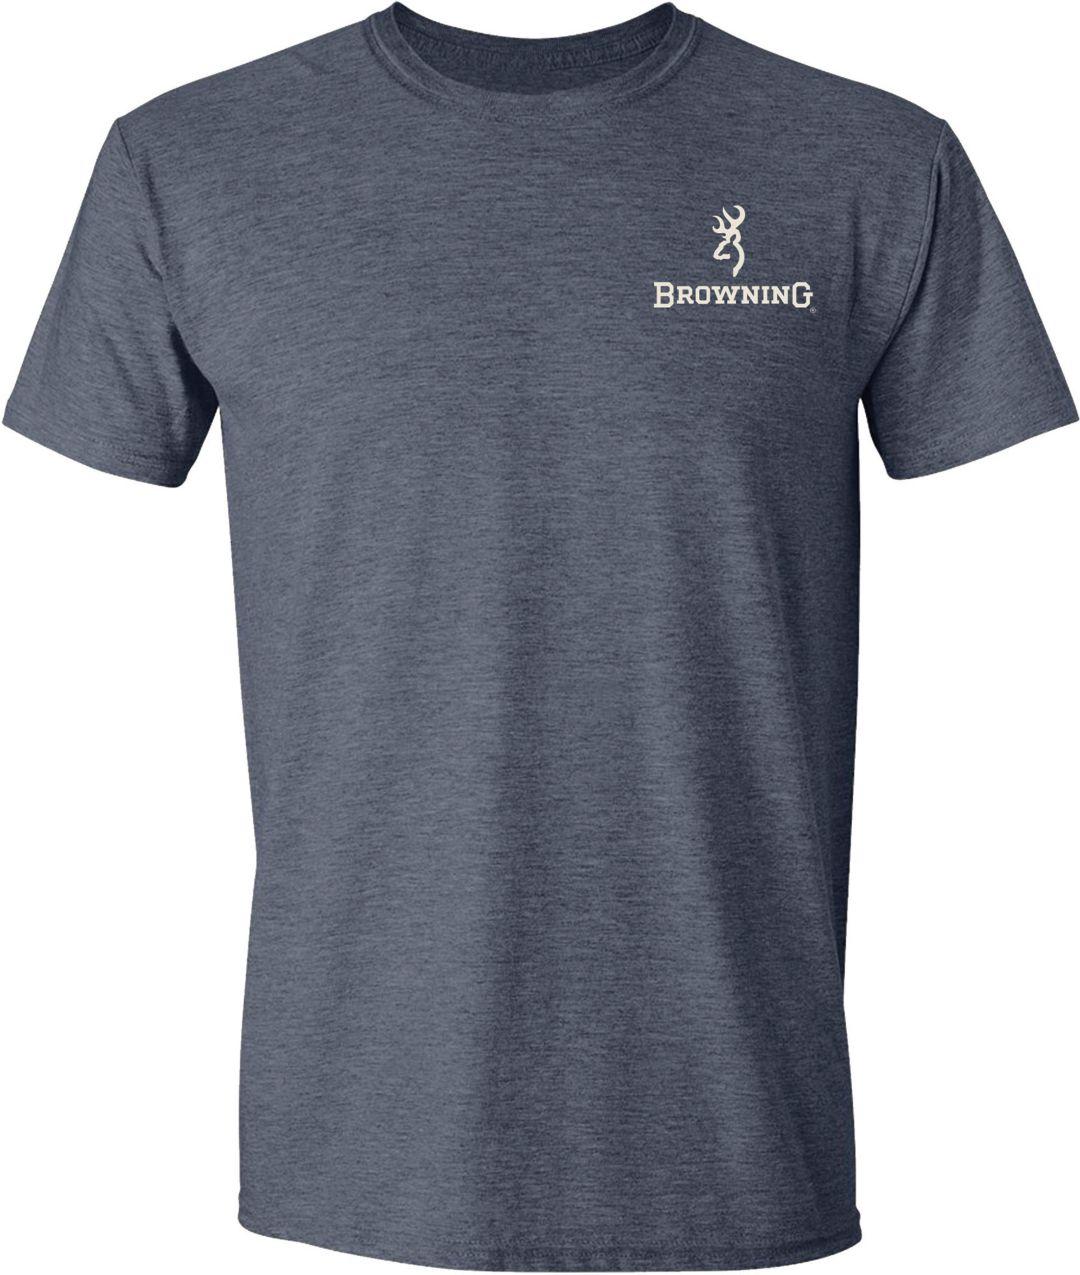 468d83c2 Browning Men's Shotgun Shell Flag Short Sleeve T-Shirt   DICK'S ...